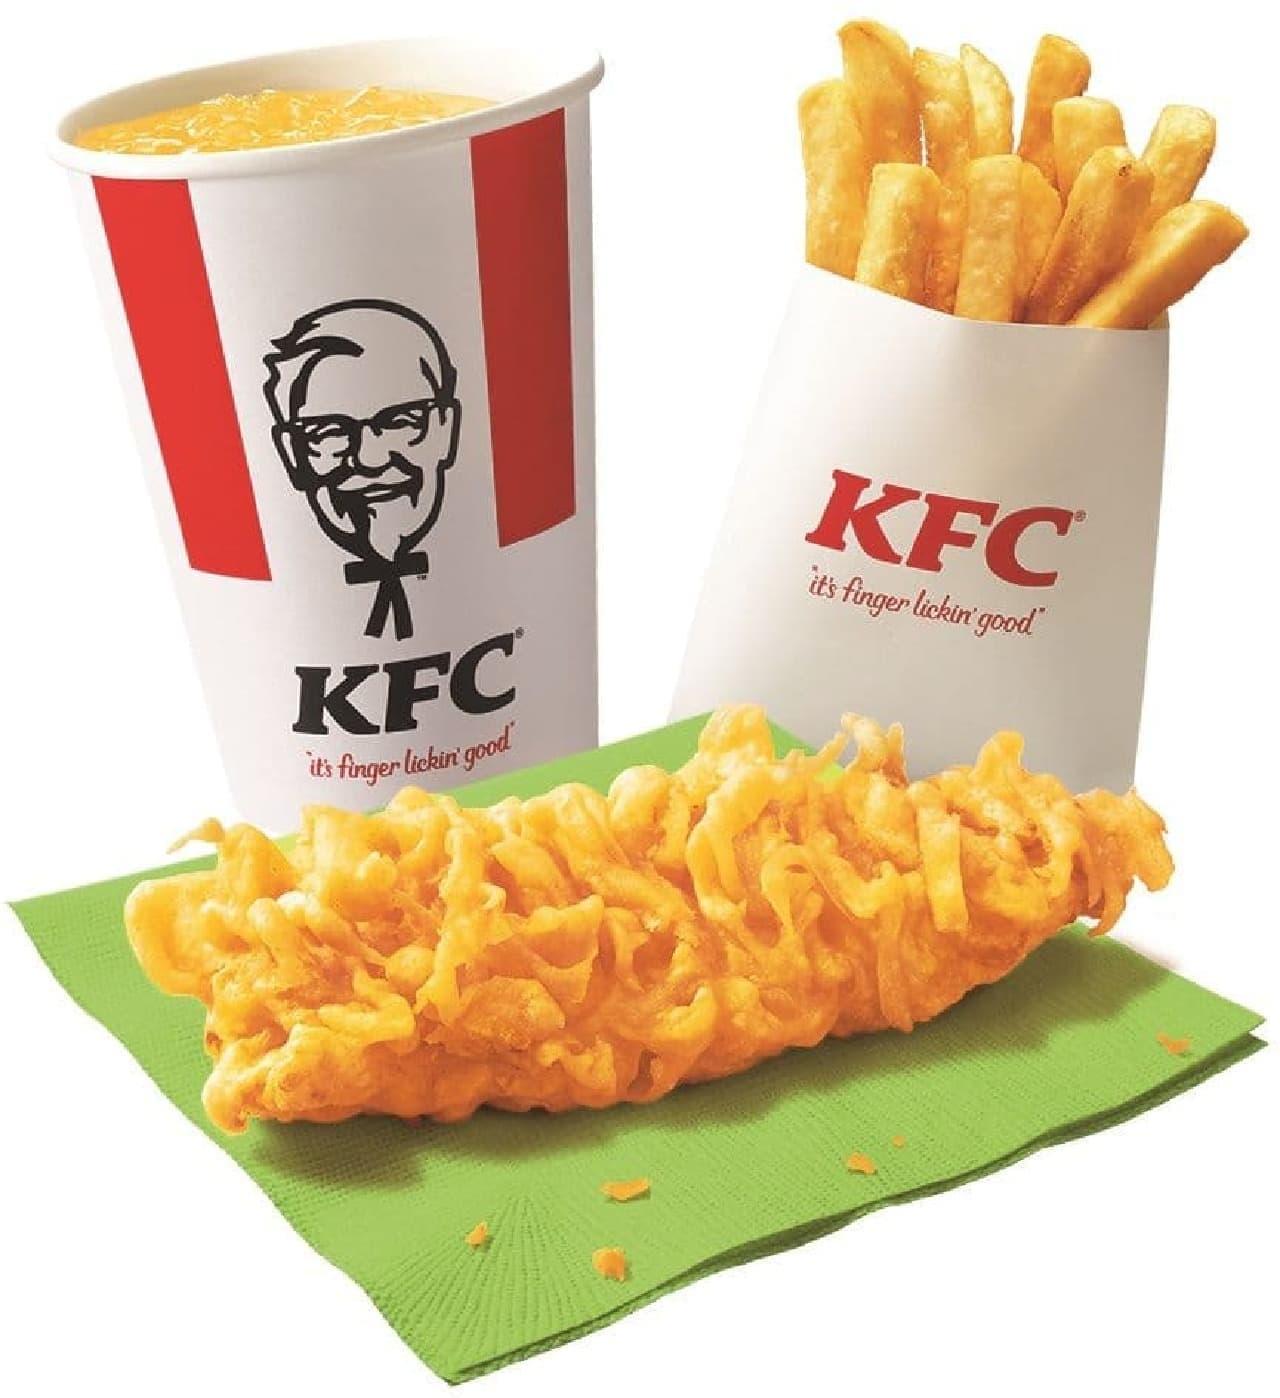 KFC「キッズクリスピーセット」